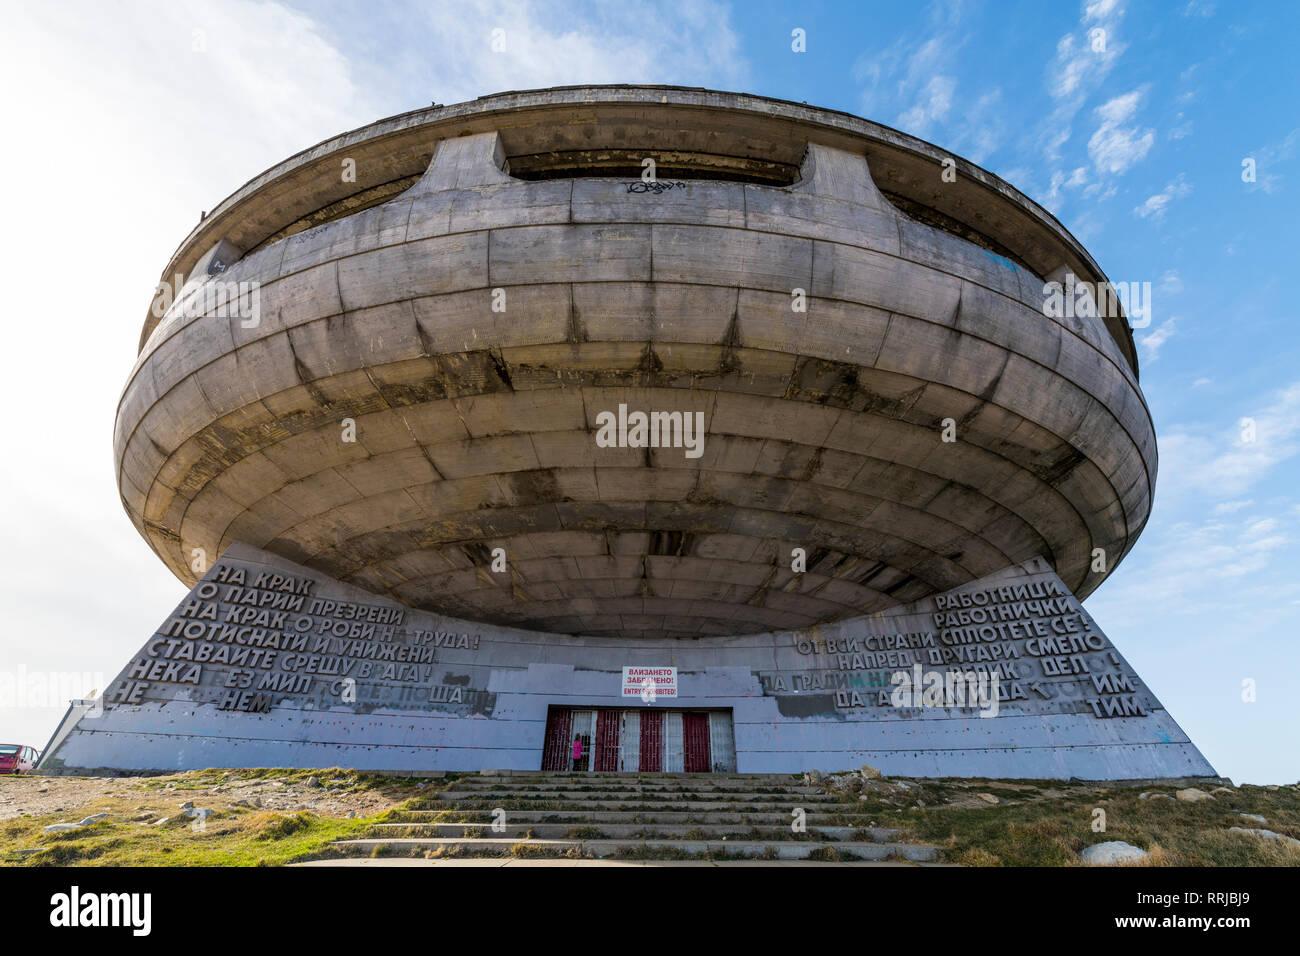 House of Bulgarian Communist Party, Buzludzha site, Bulgaria, Europe - Stock Image